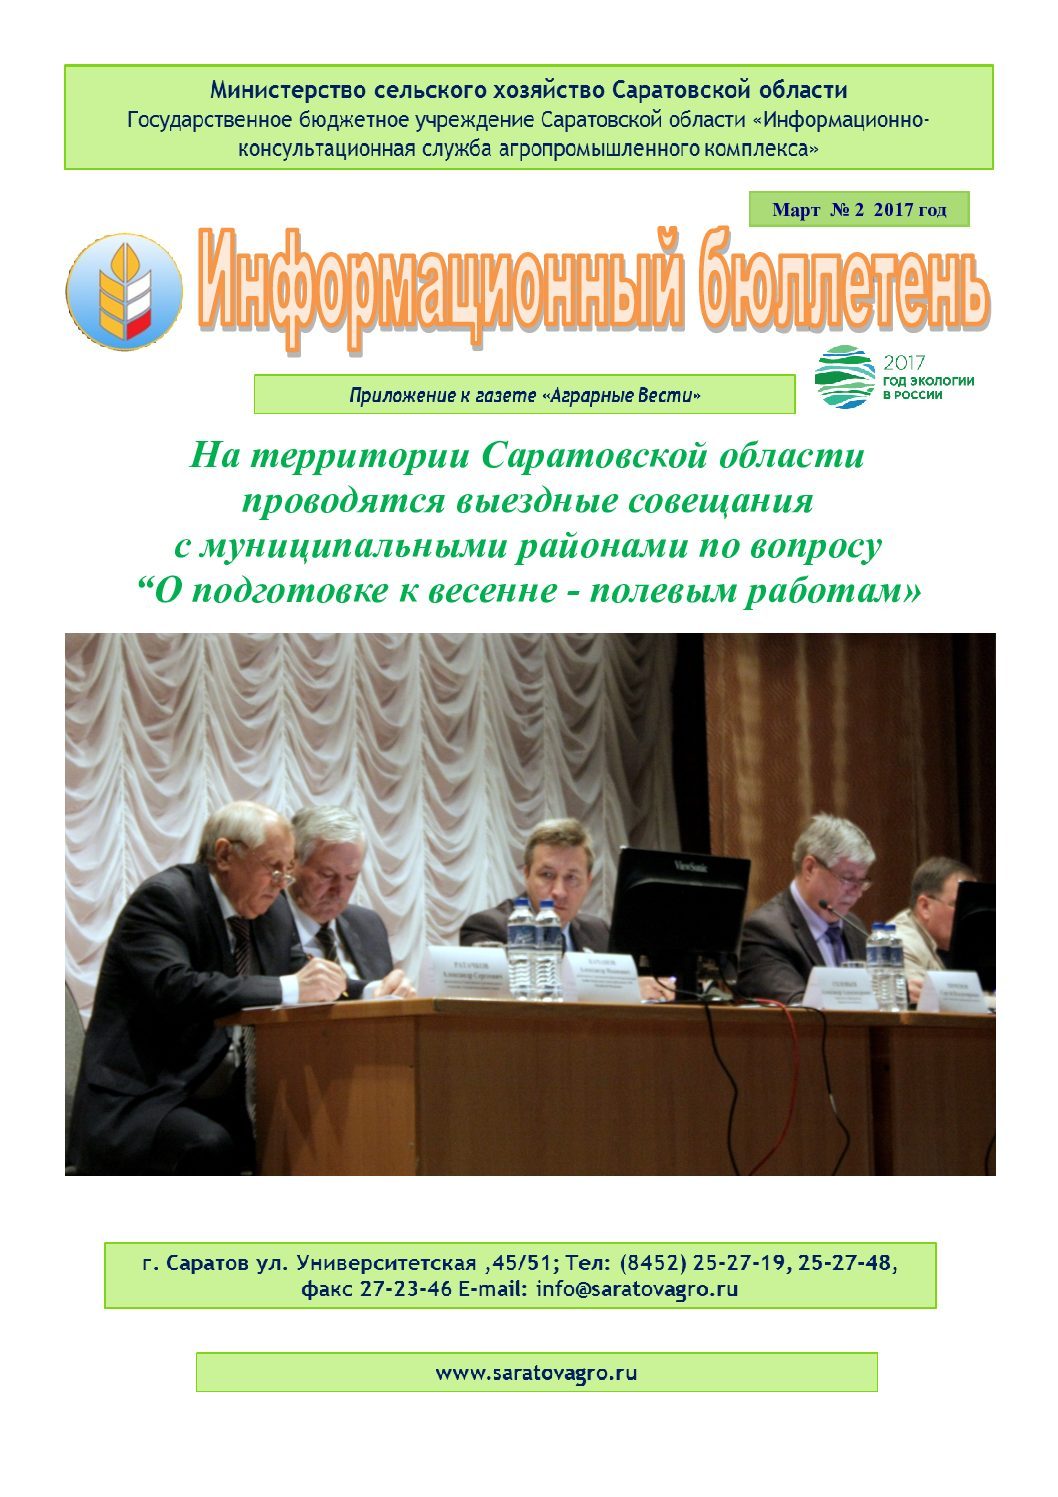 https://saratovagro.ru/wp-content/uploads/2020/08/2.2017-pdf.jpg